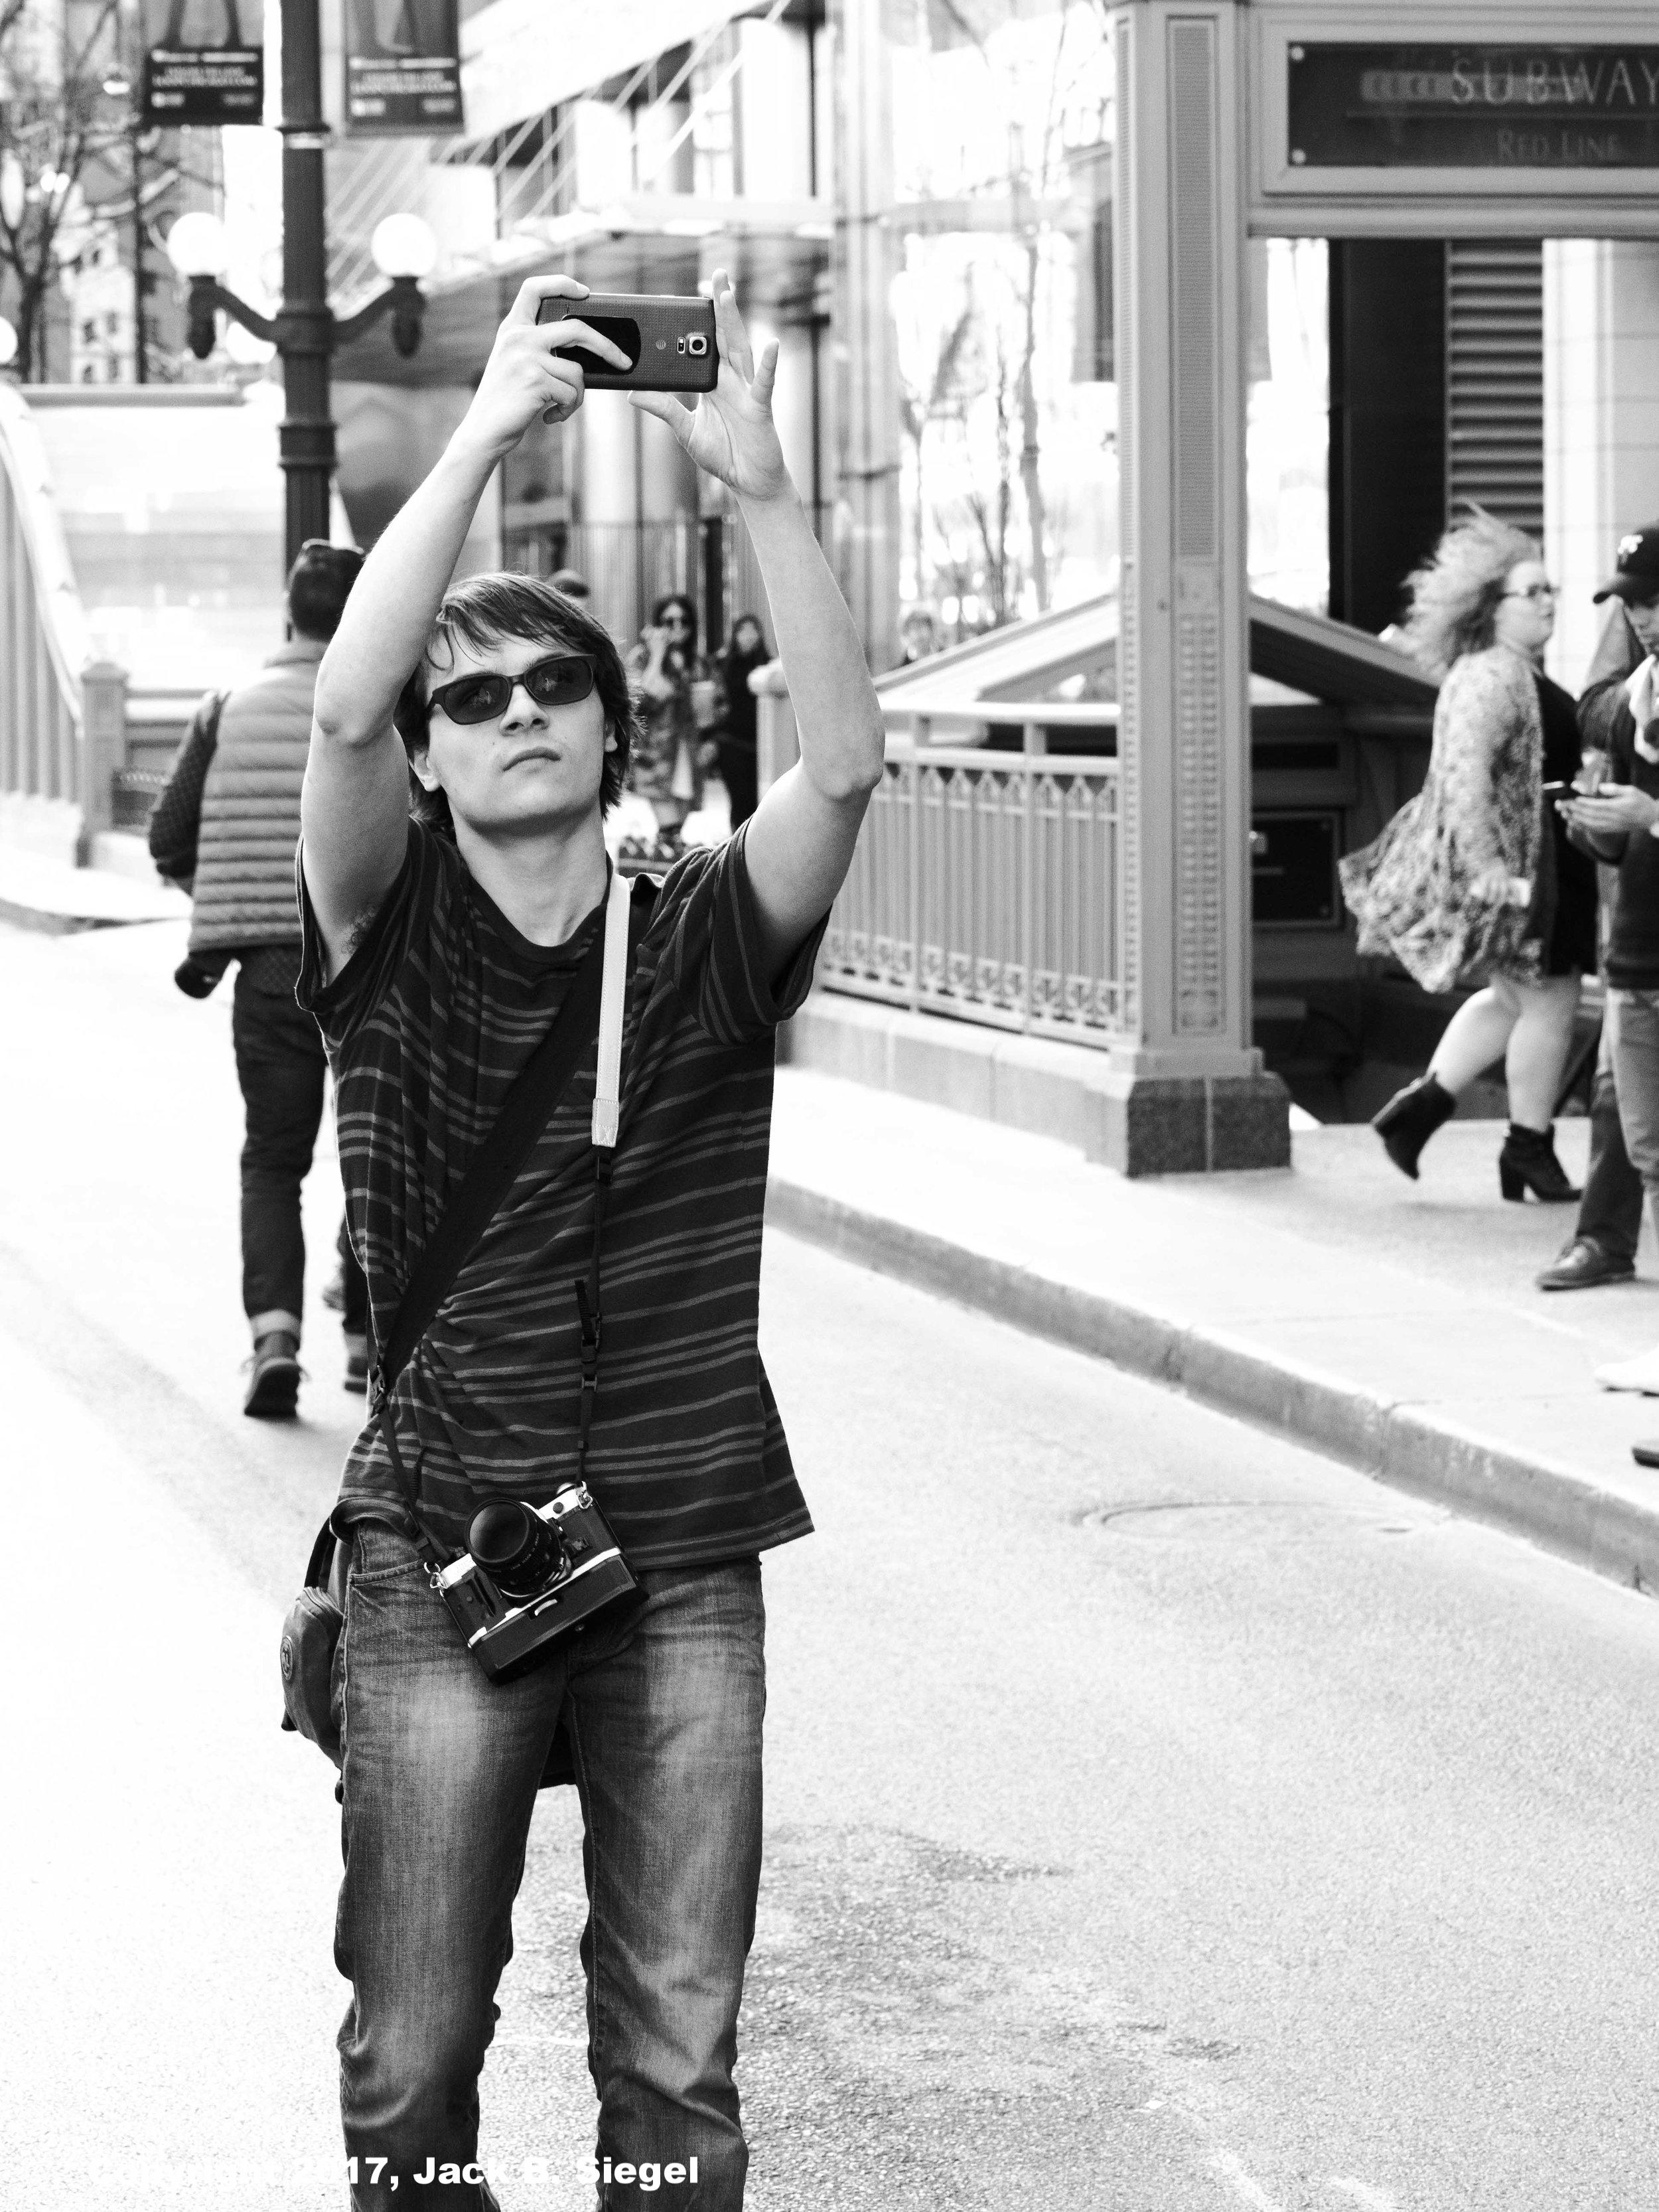 Film and Digital: Cool